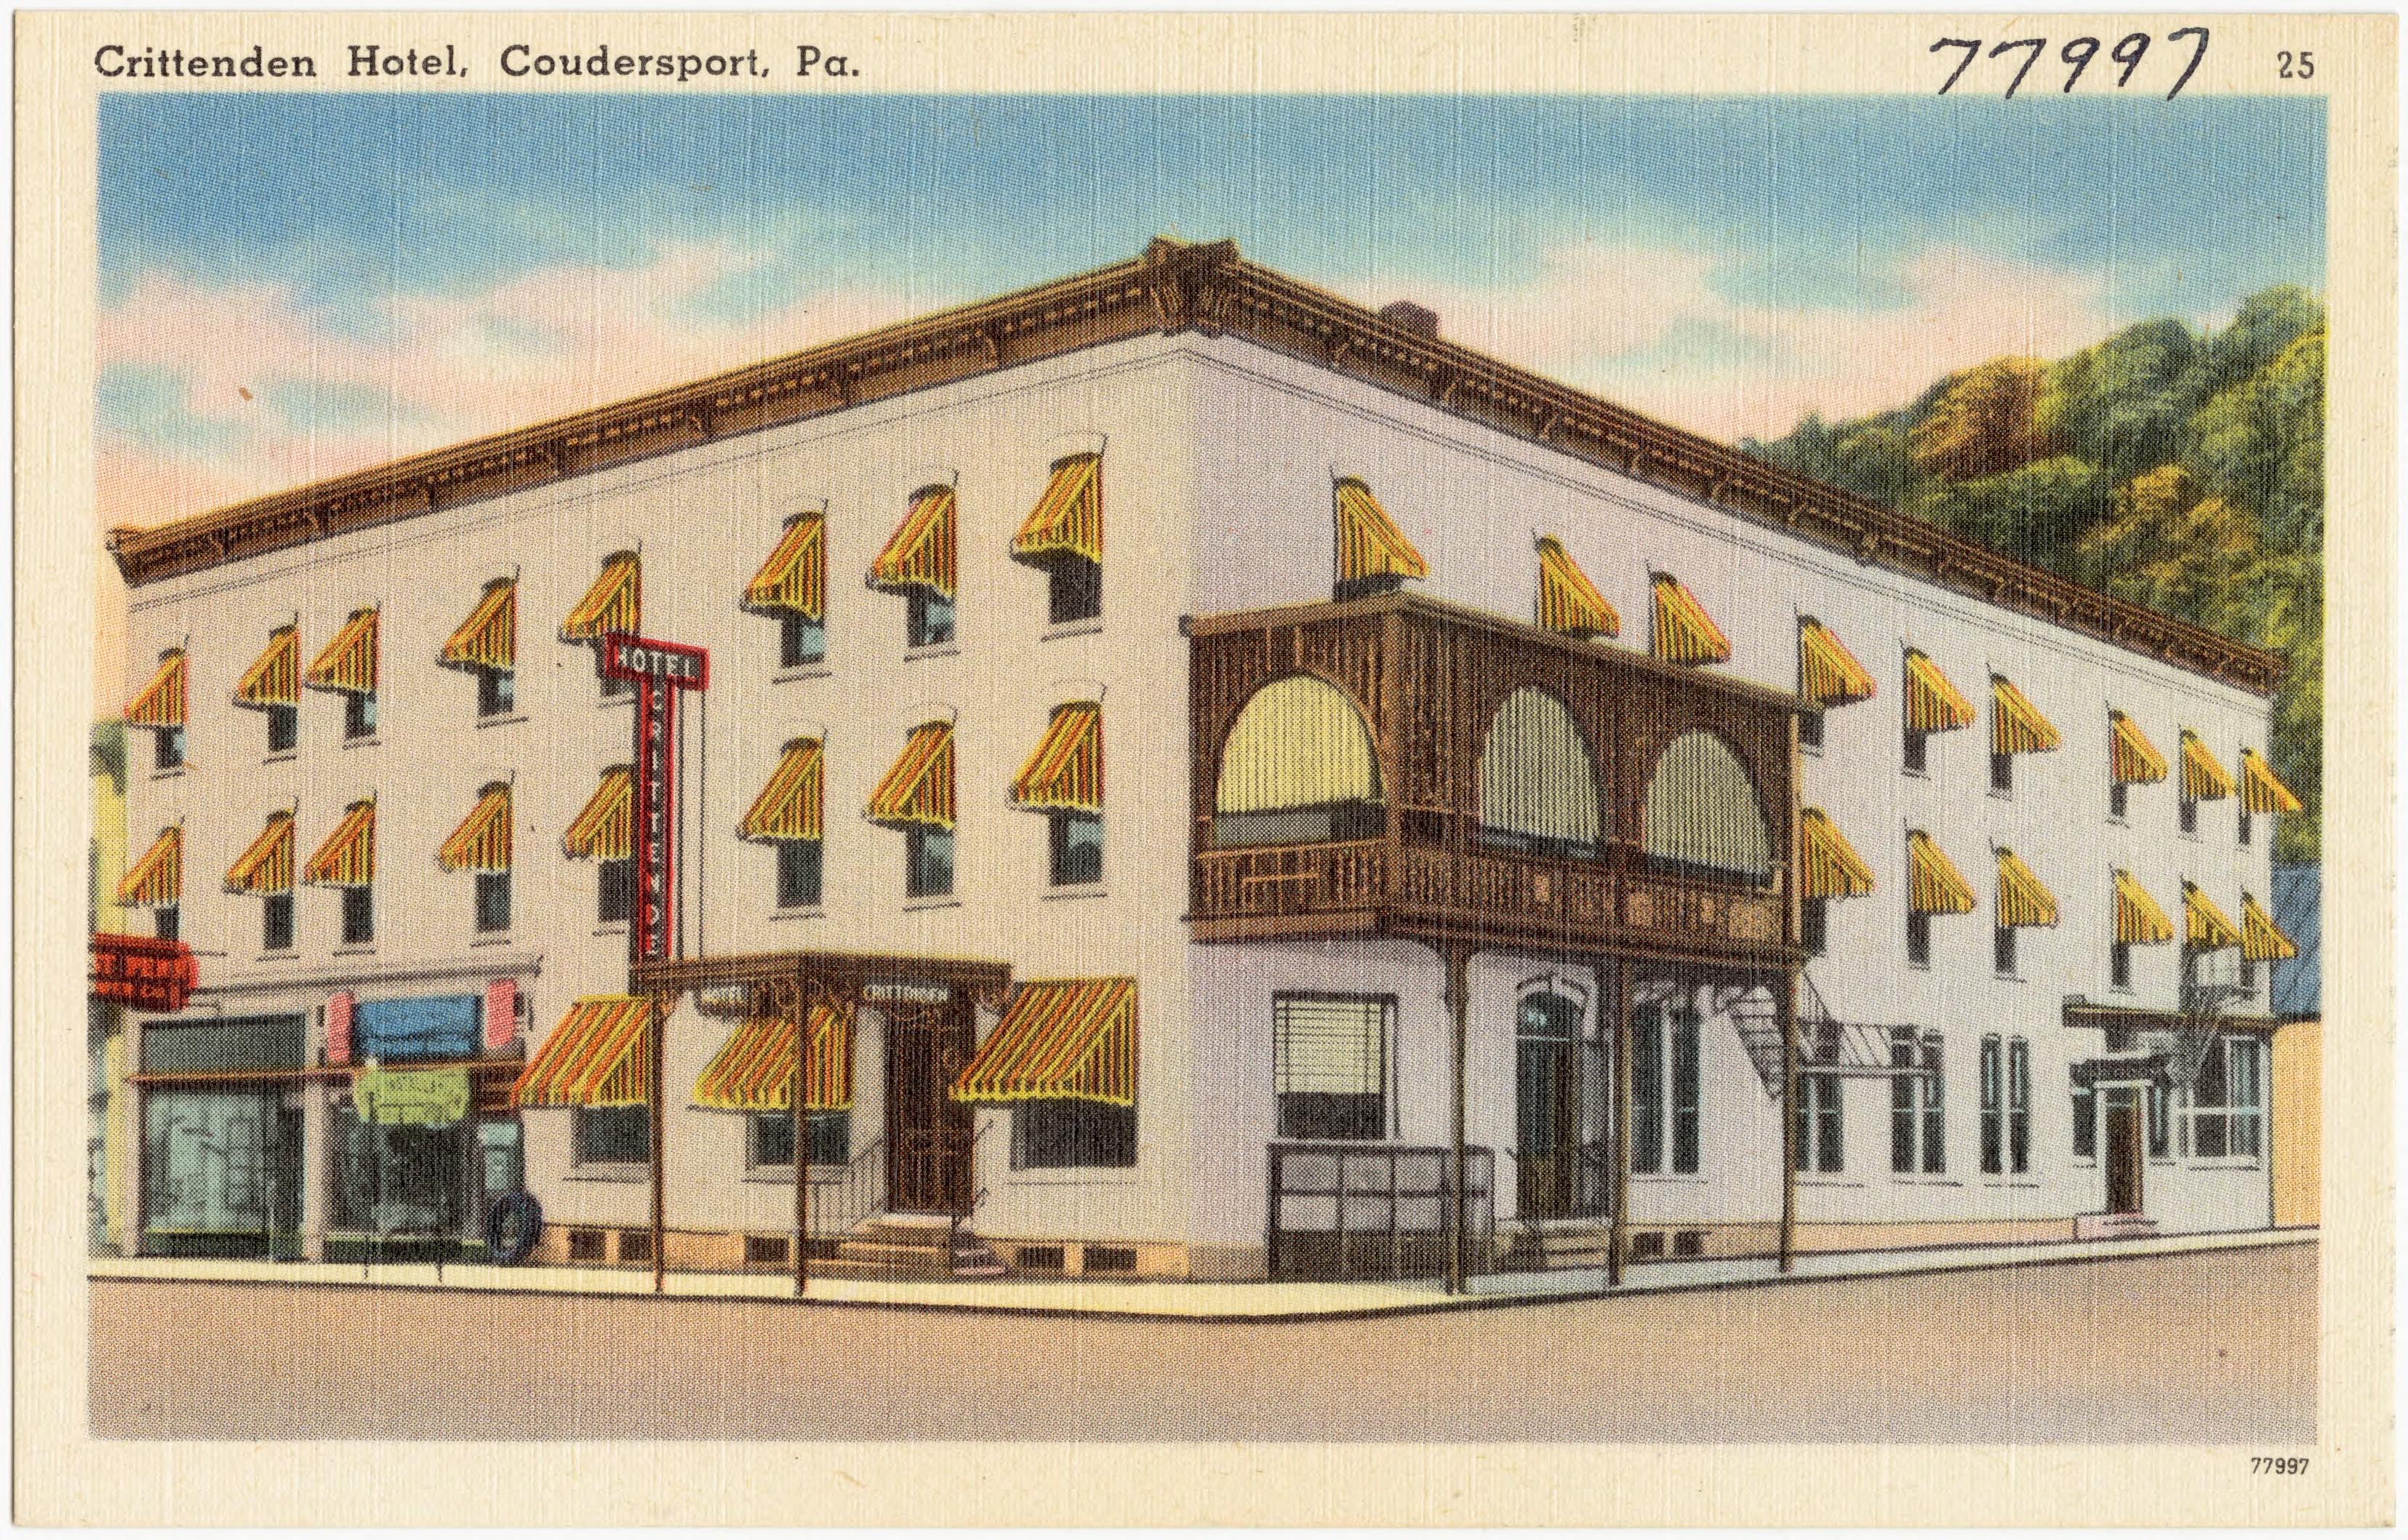 File Crittenden Hotel Coudersport Pa 77997 Jpg